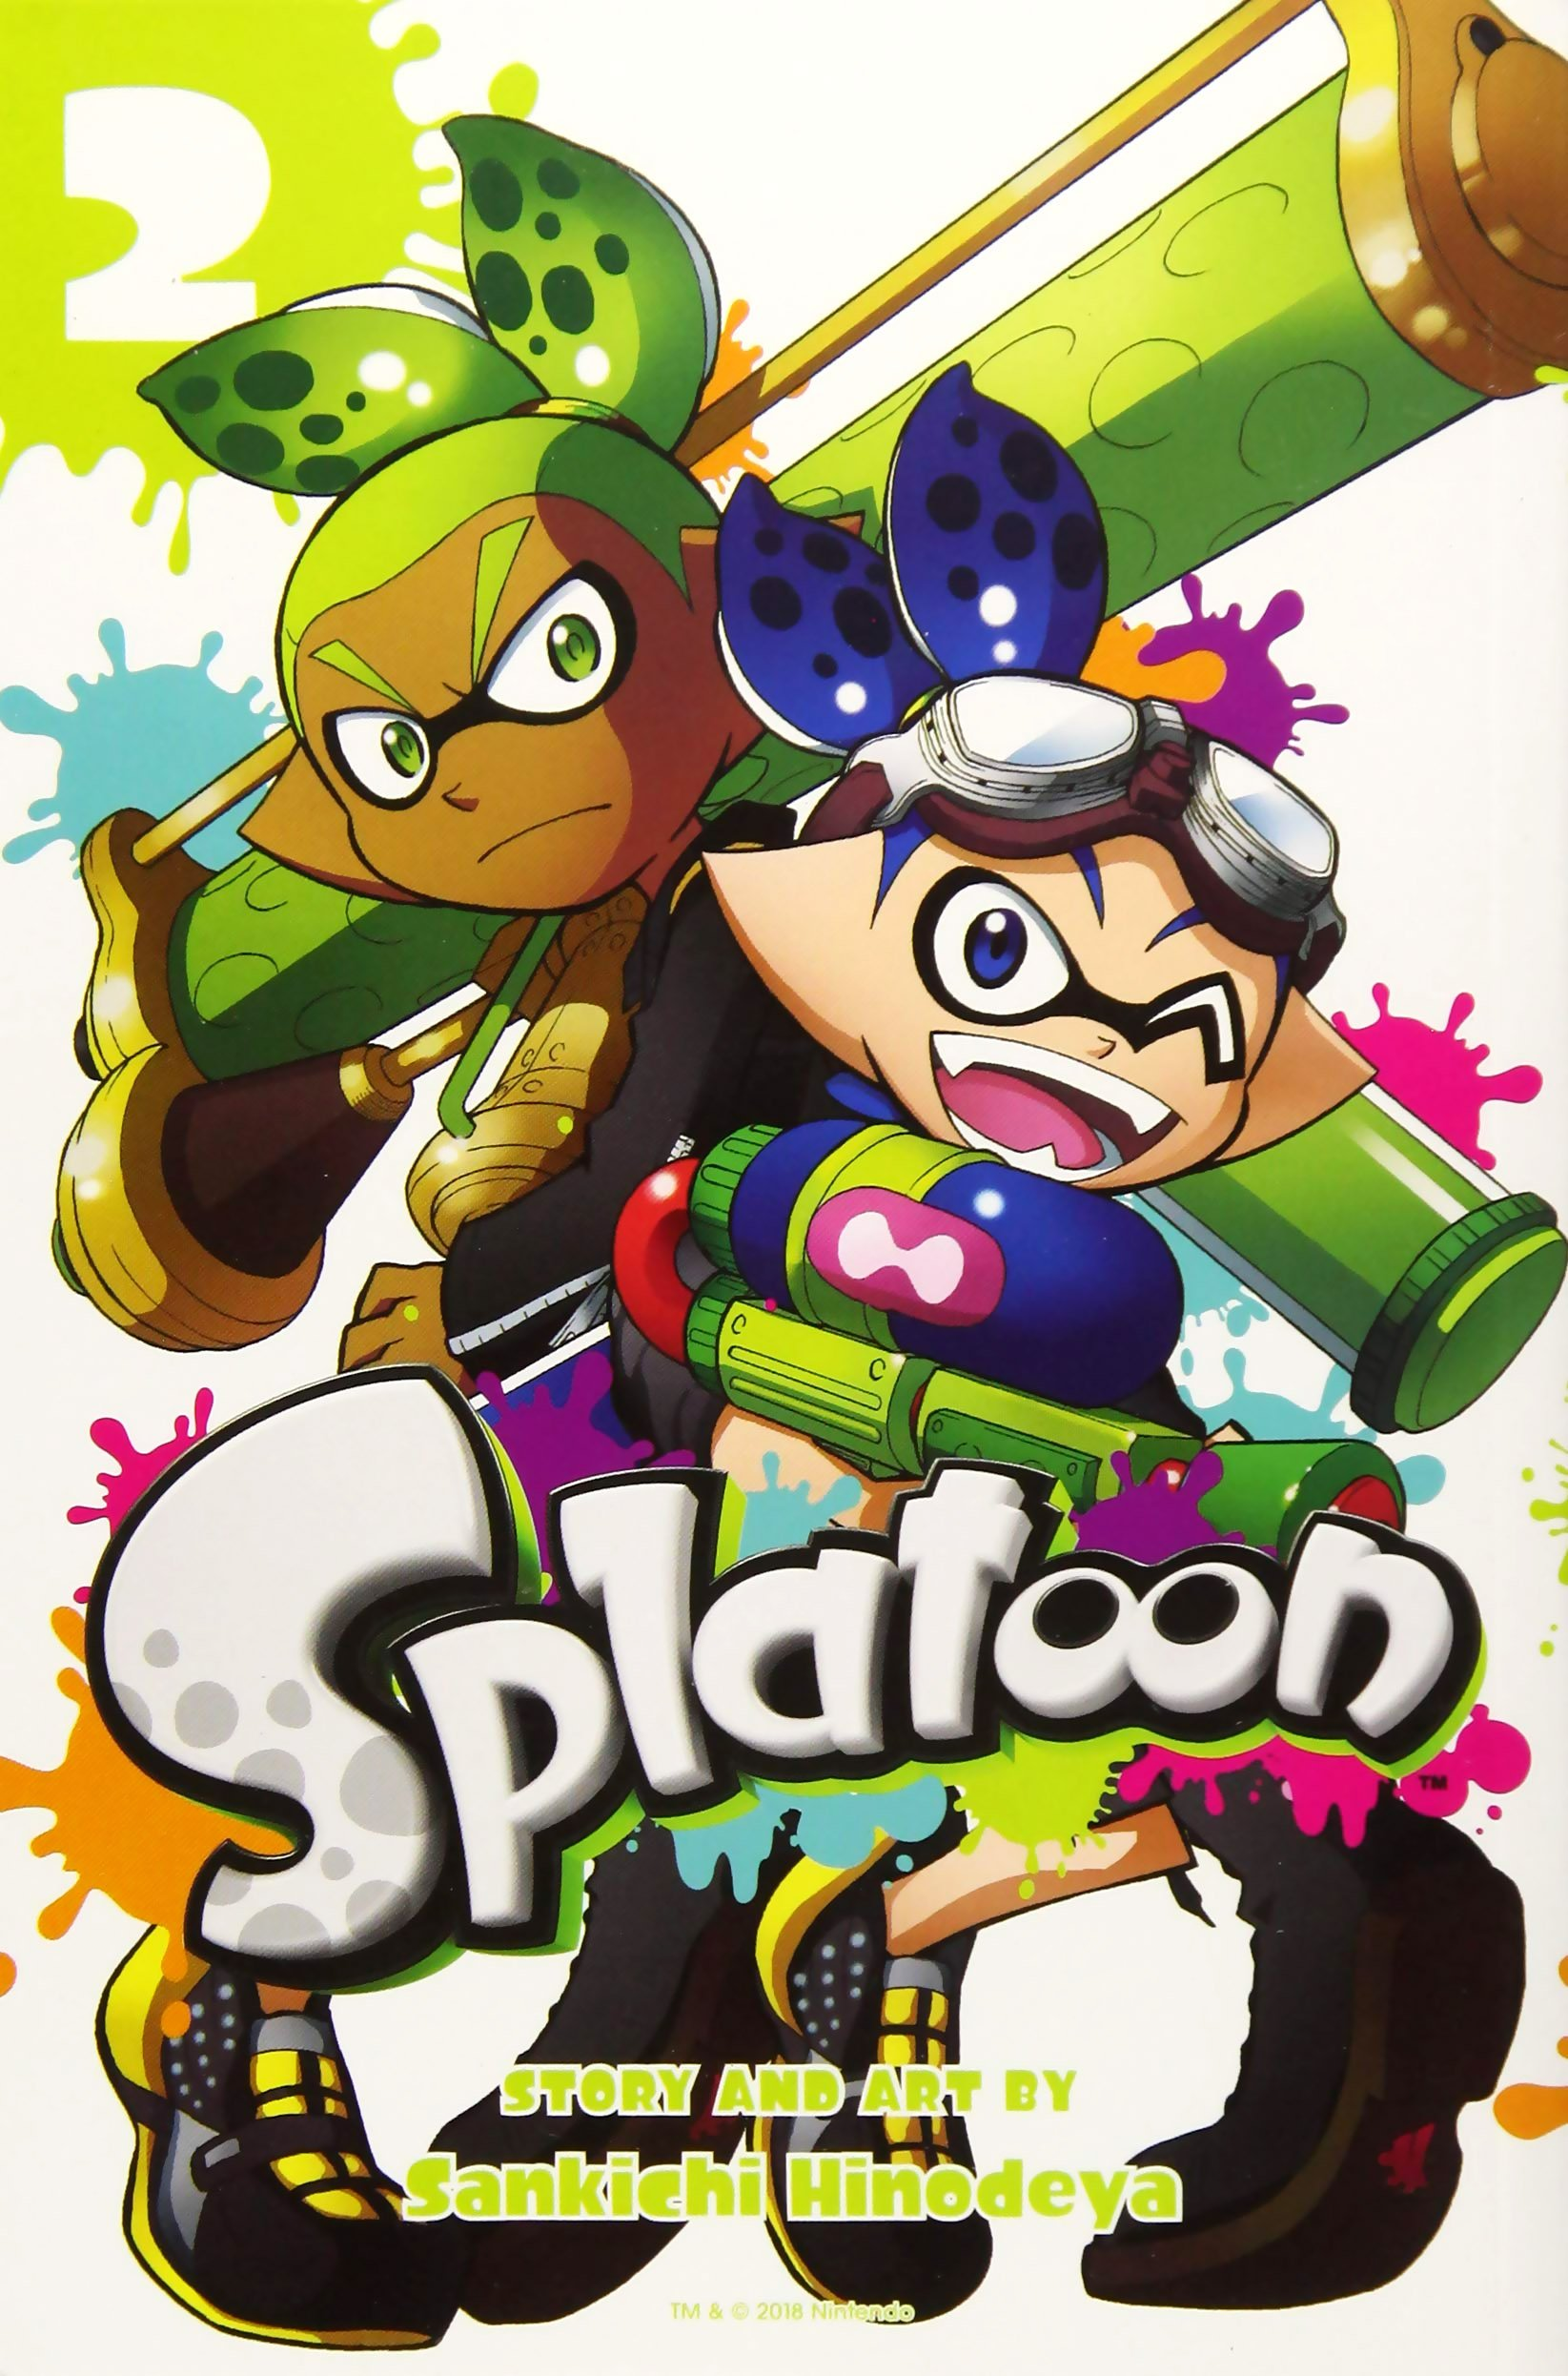 Splatoon Vol.2